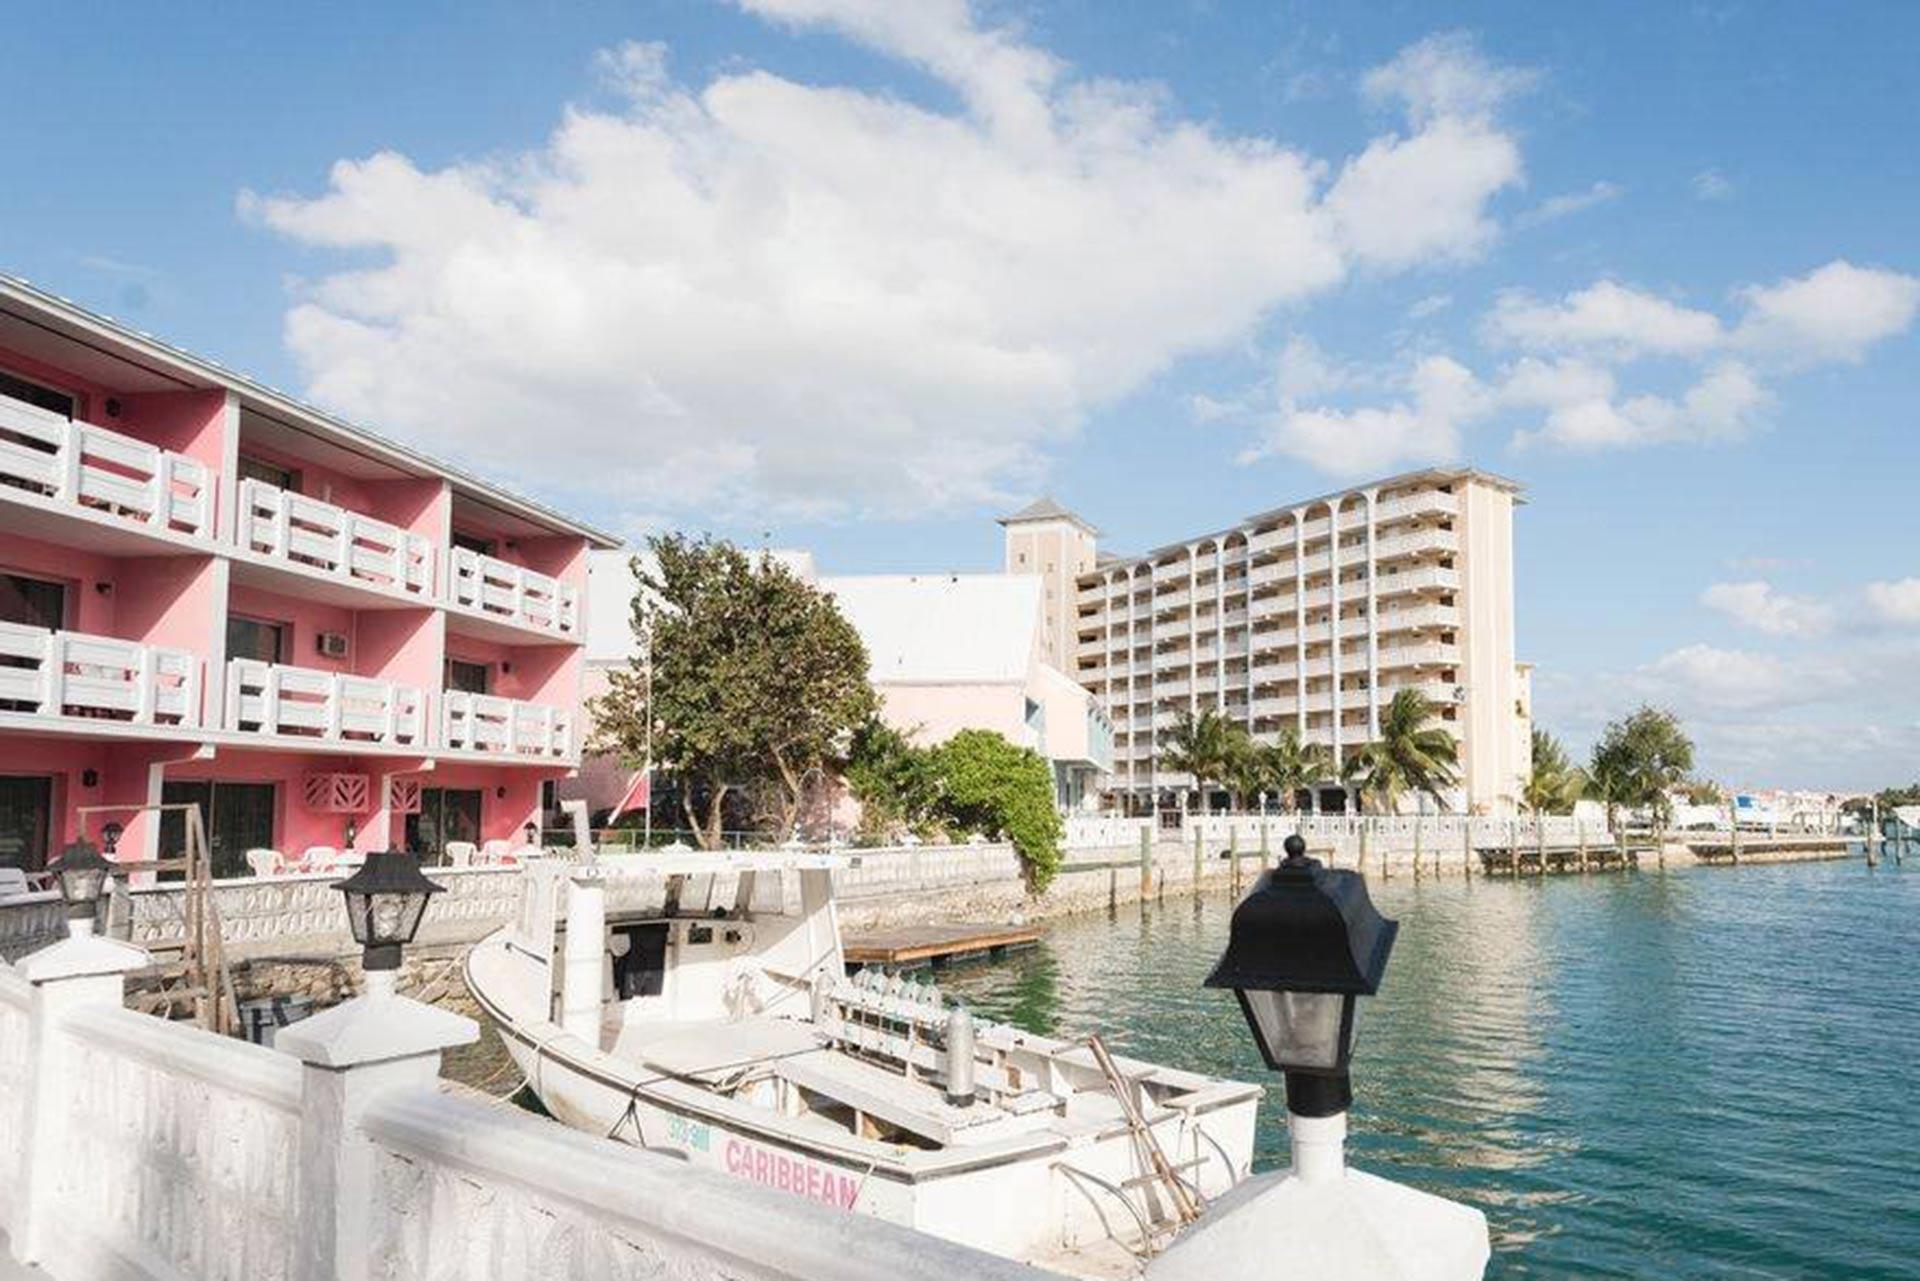 Bell Channel Inn on Grand Bahama Island